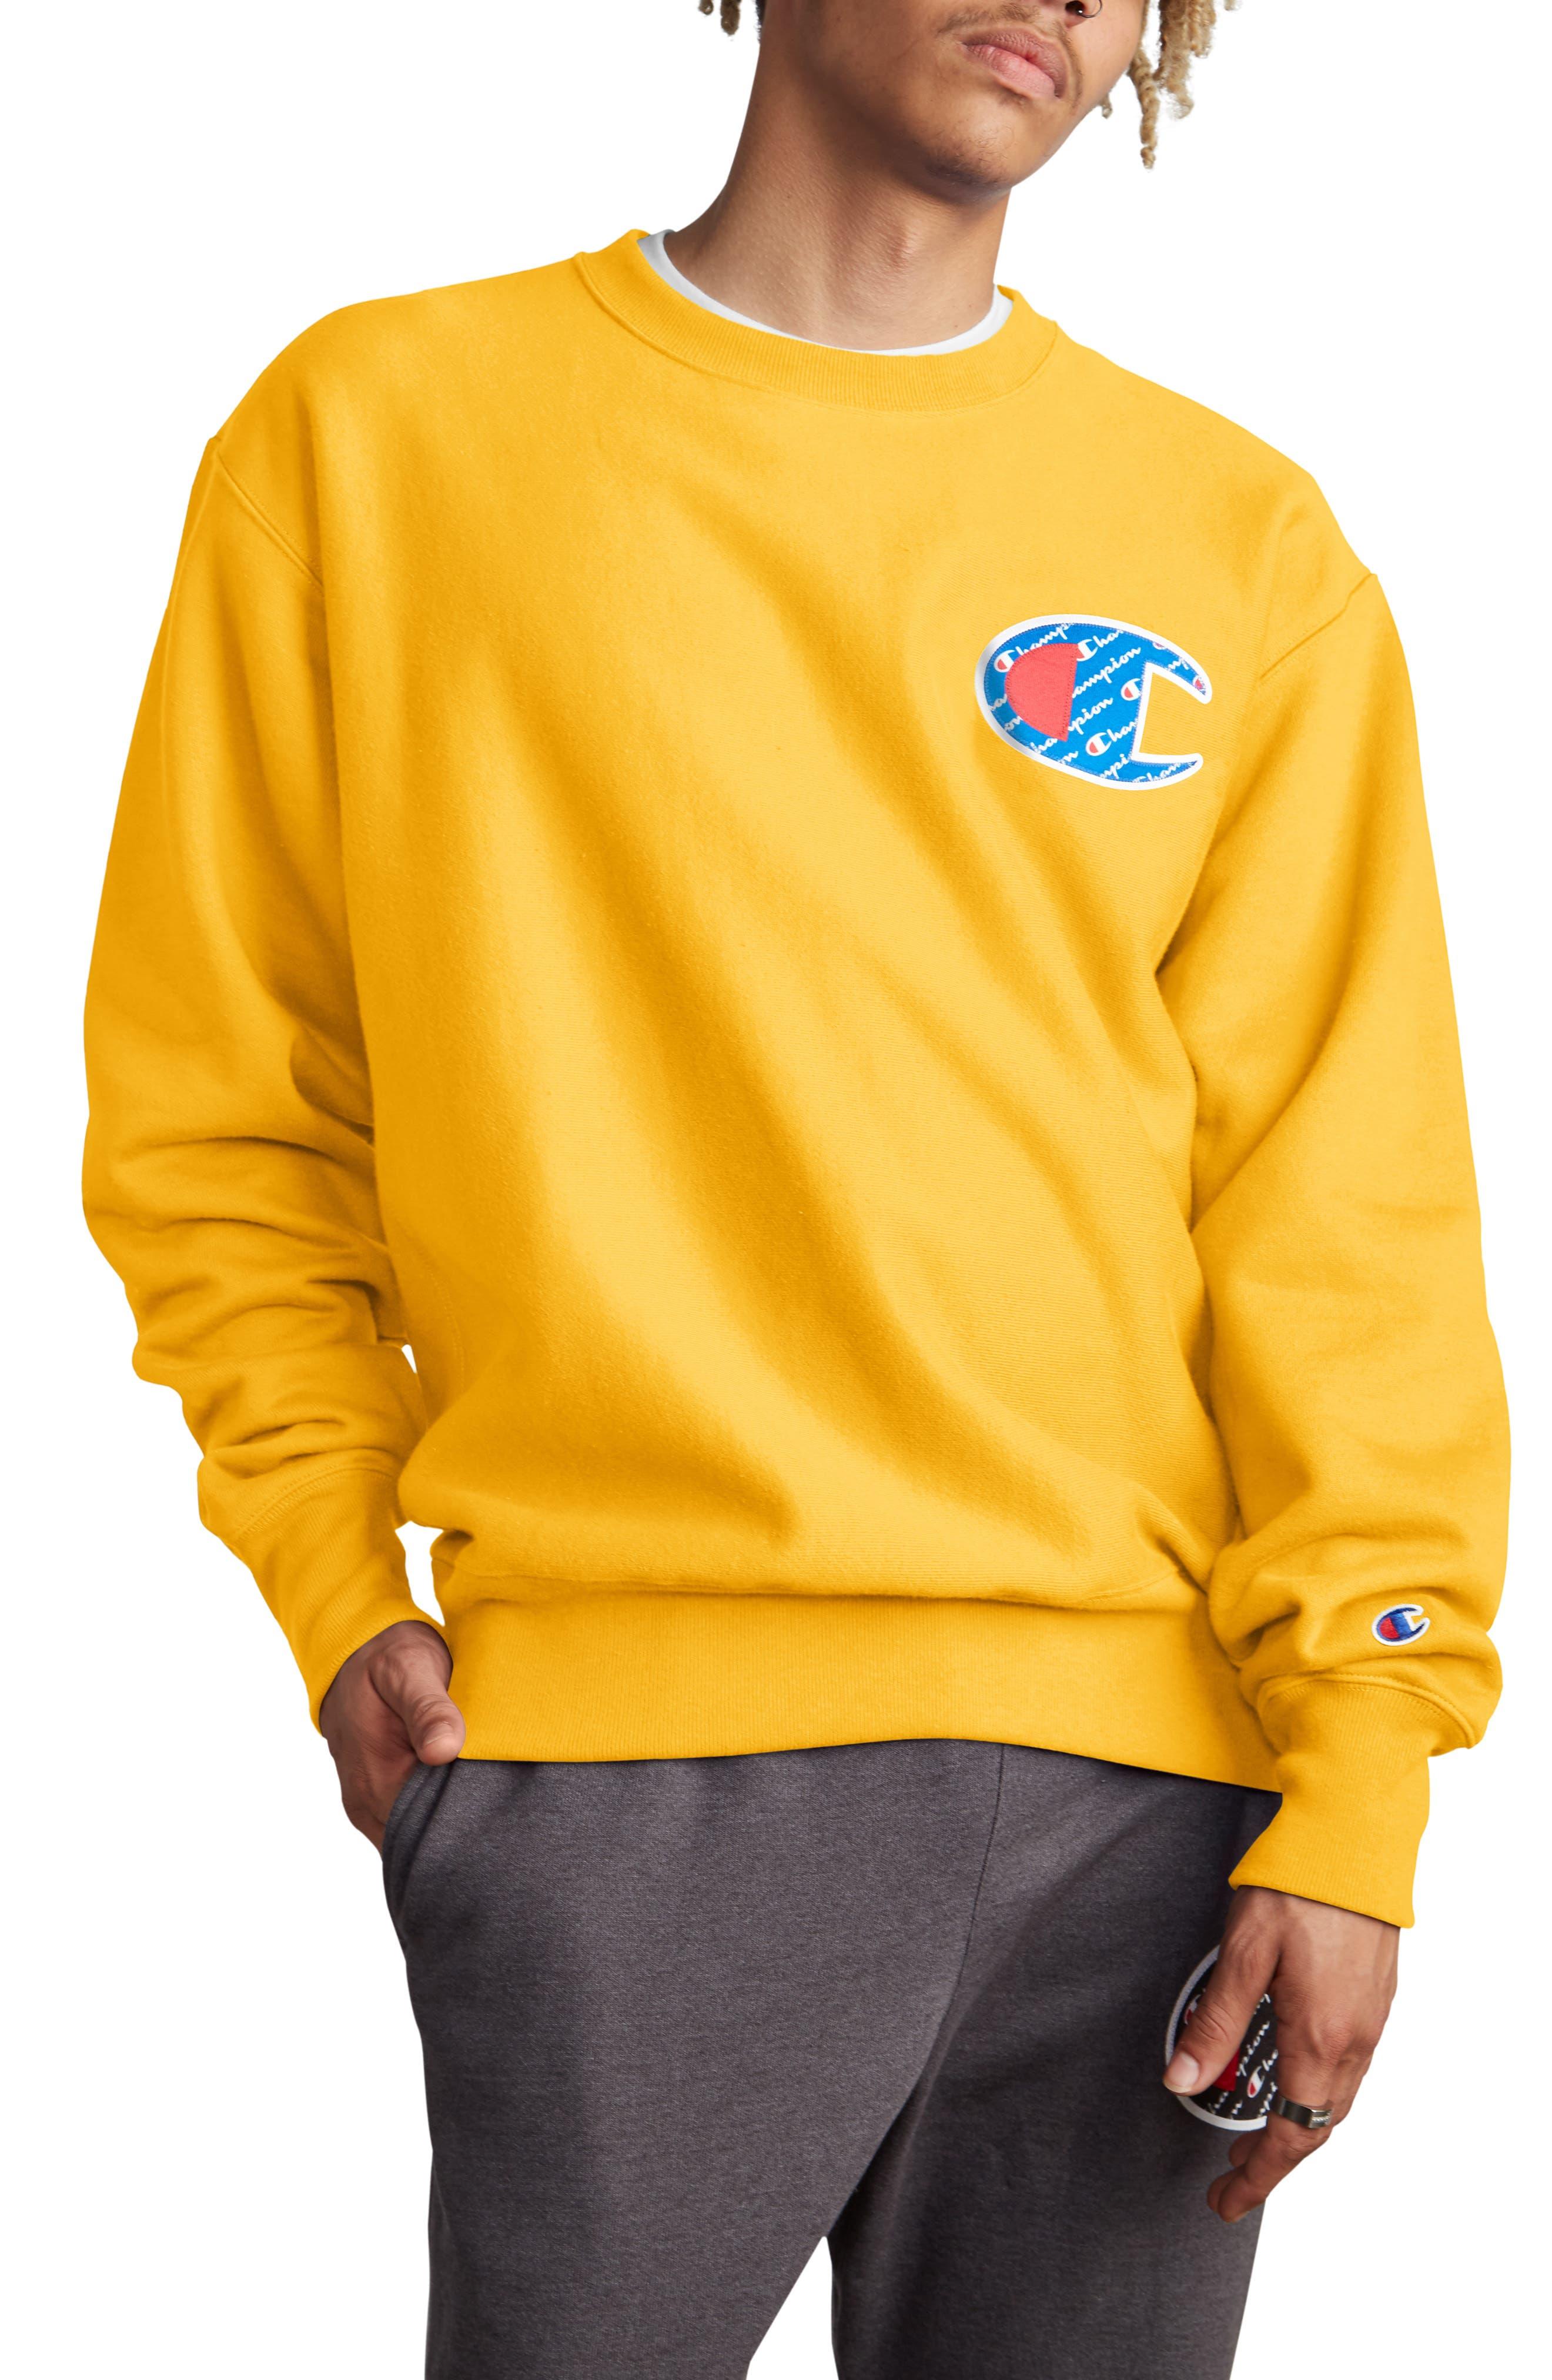 Sublimated Logo Crewneck Sweatshirt,                             Main thumbnail 1, color,                             CHAMPION GOLD